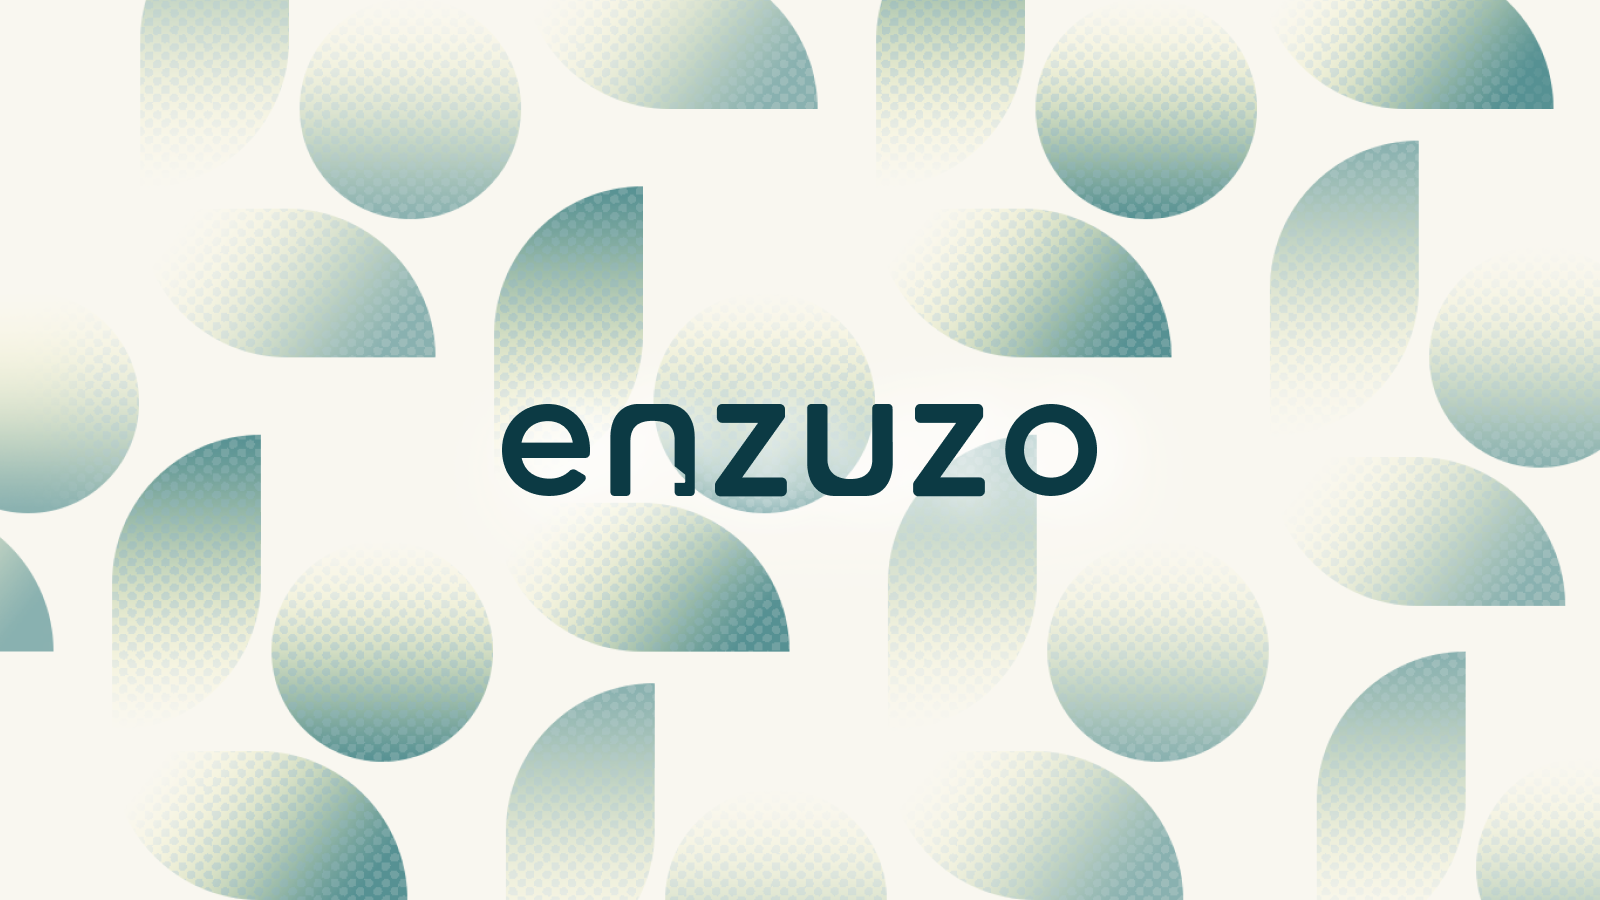 Enzuzo Data Privacy